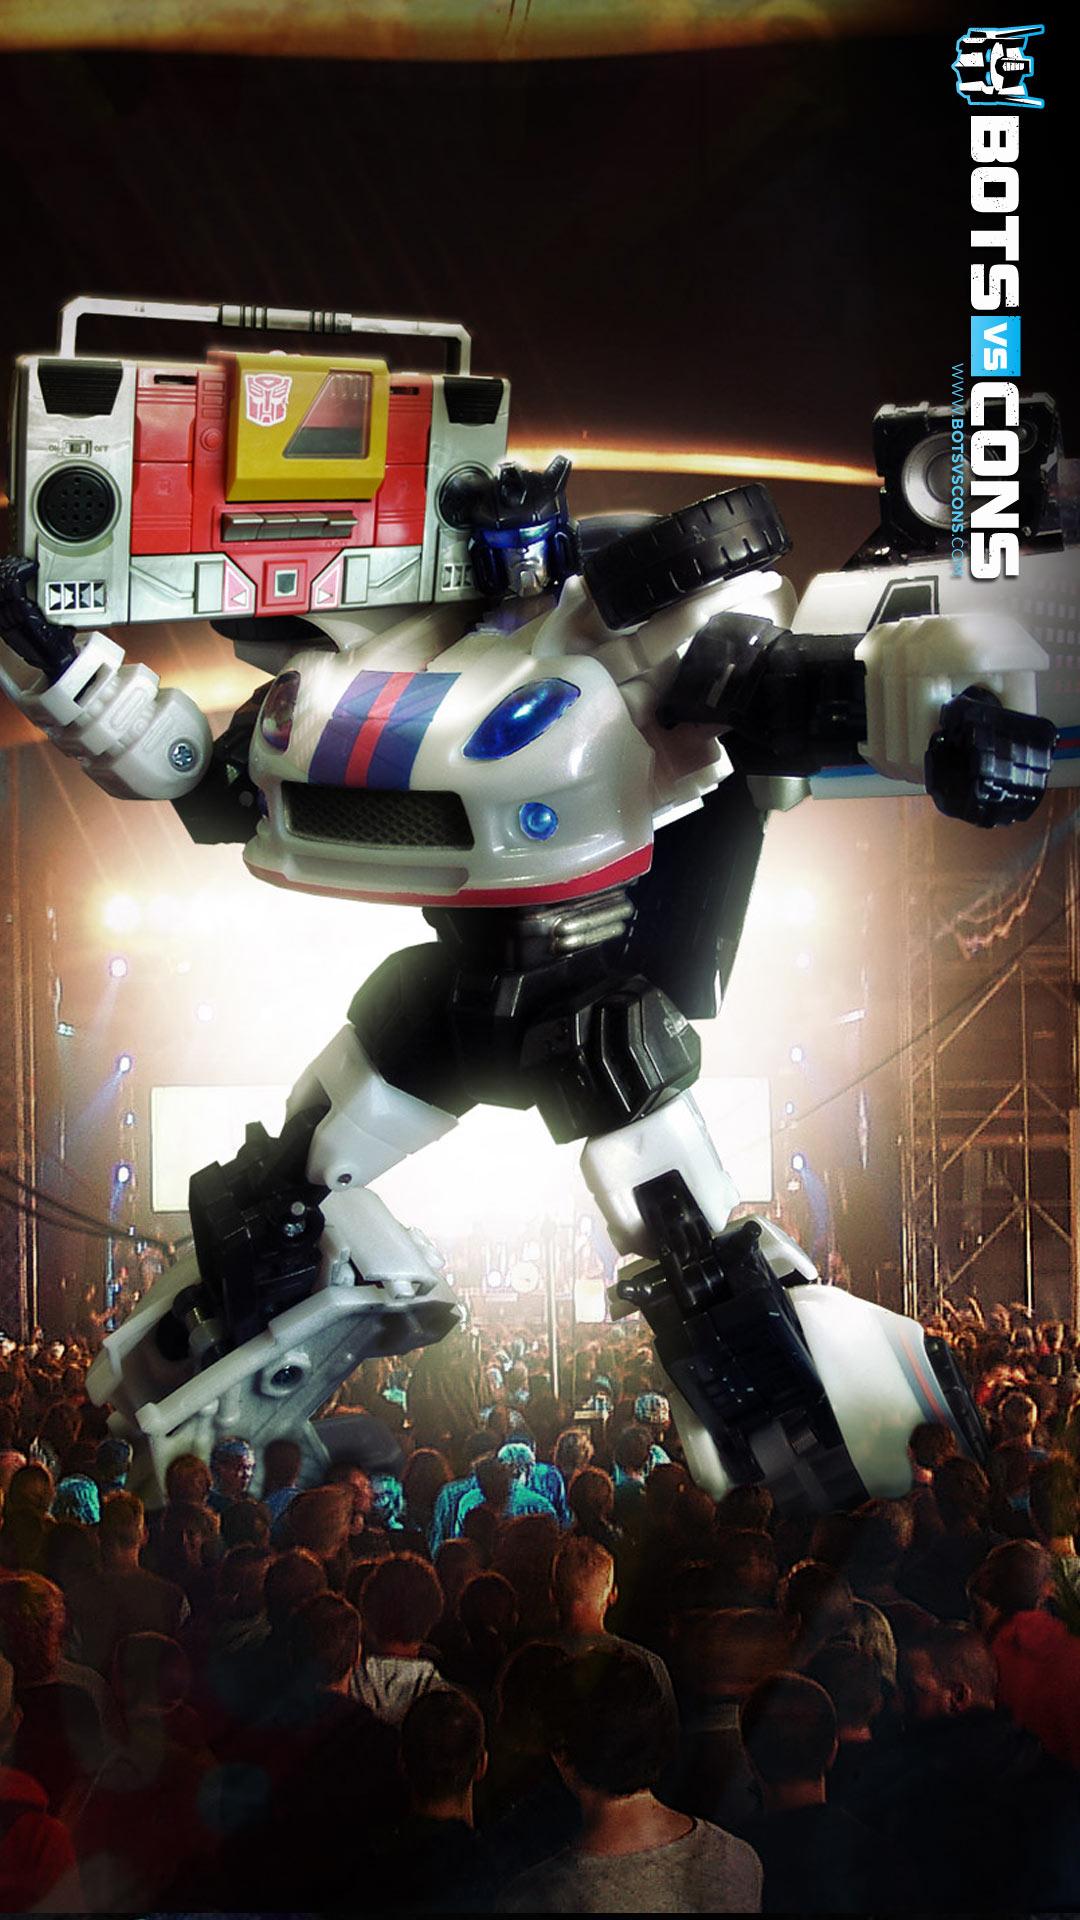 Jazz Blaster Transformers G1 Wallpaper